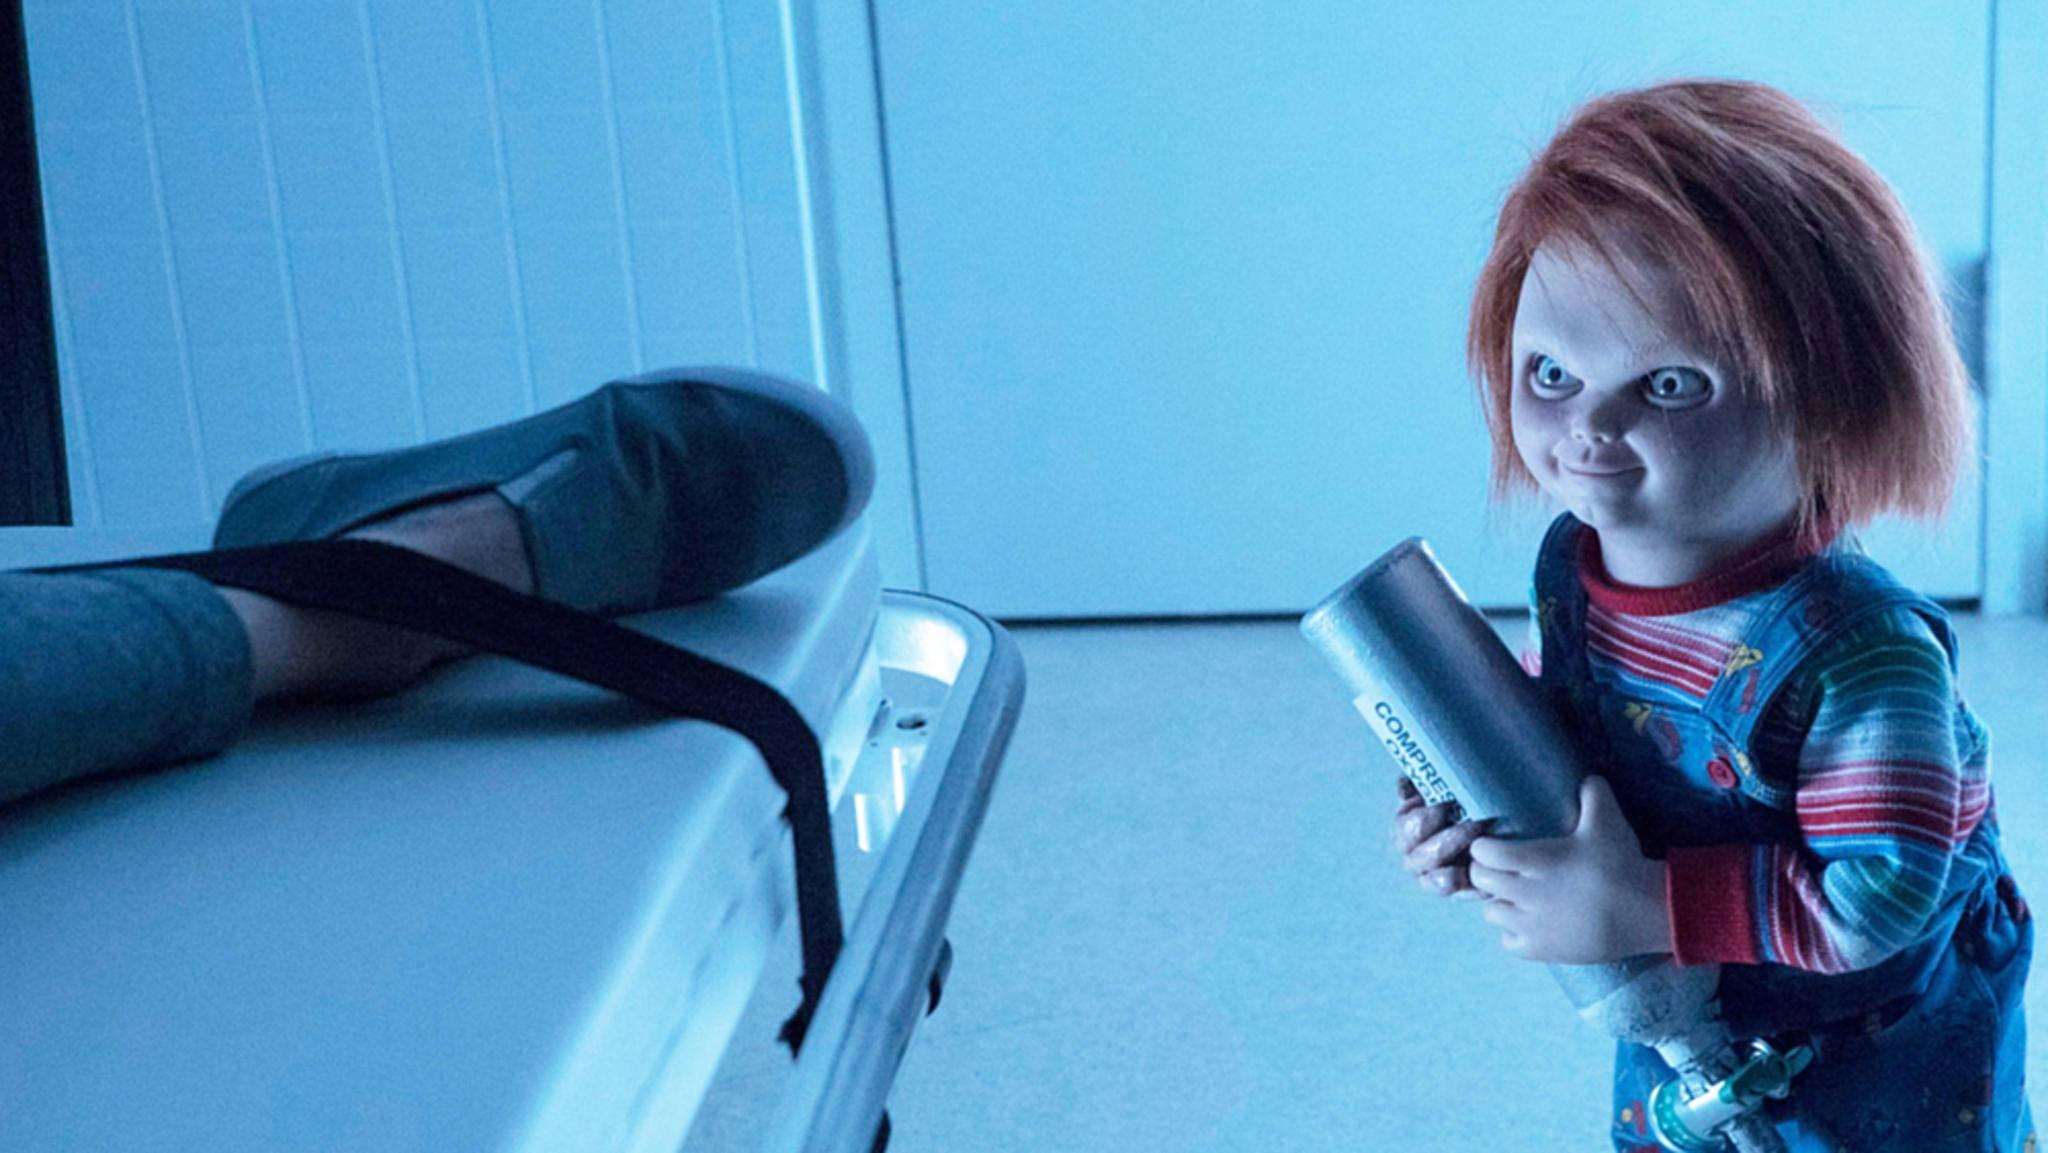 Chucky ist schon bald zurück!